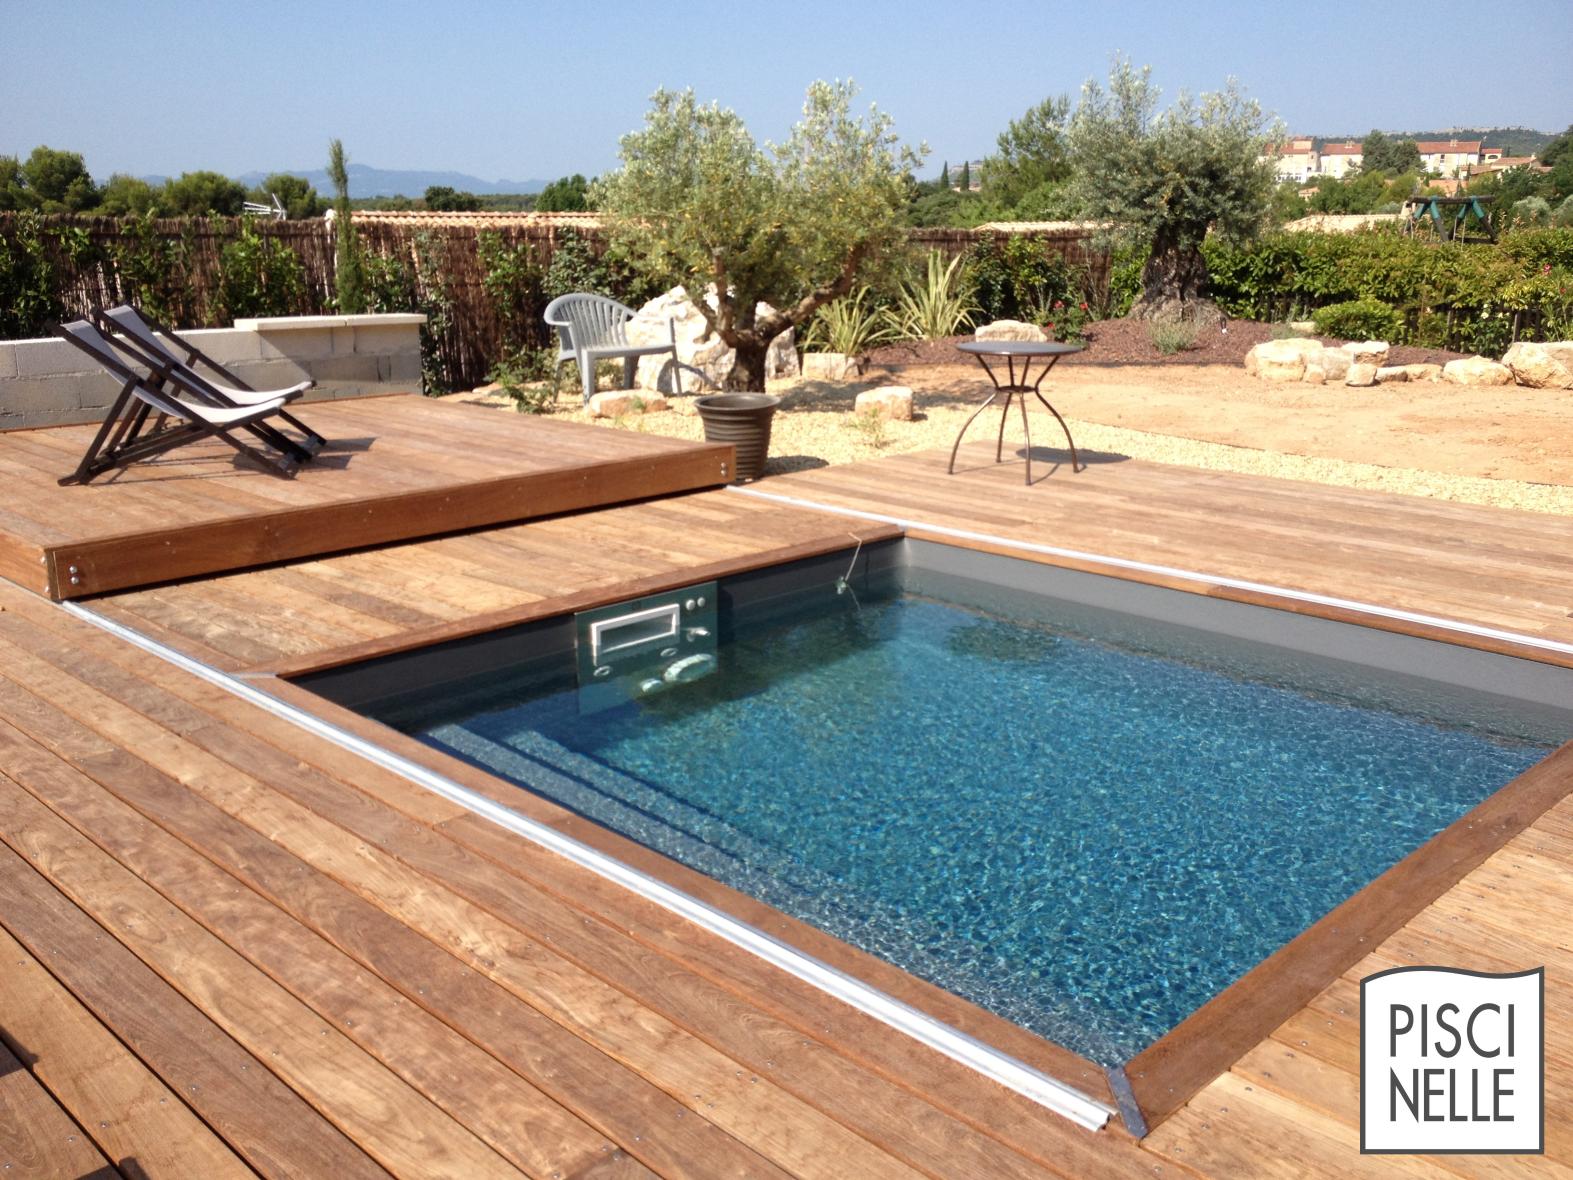 Une Terrasse Mobile De Piscine Rolling Deck En Provence Backyard